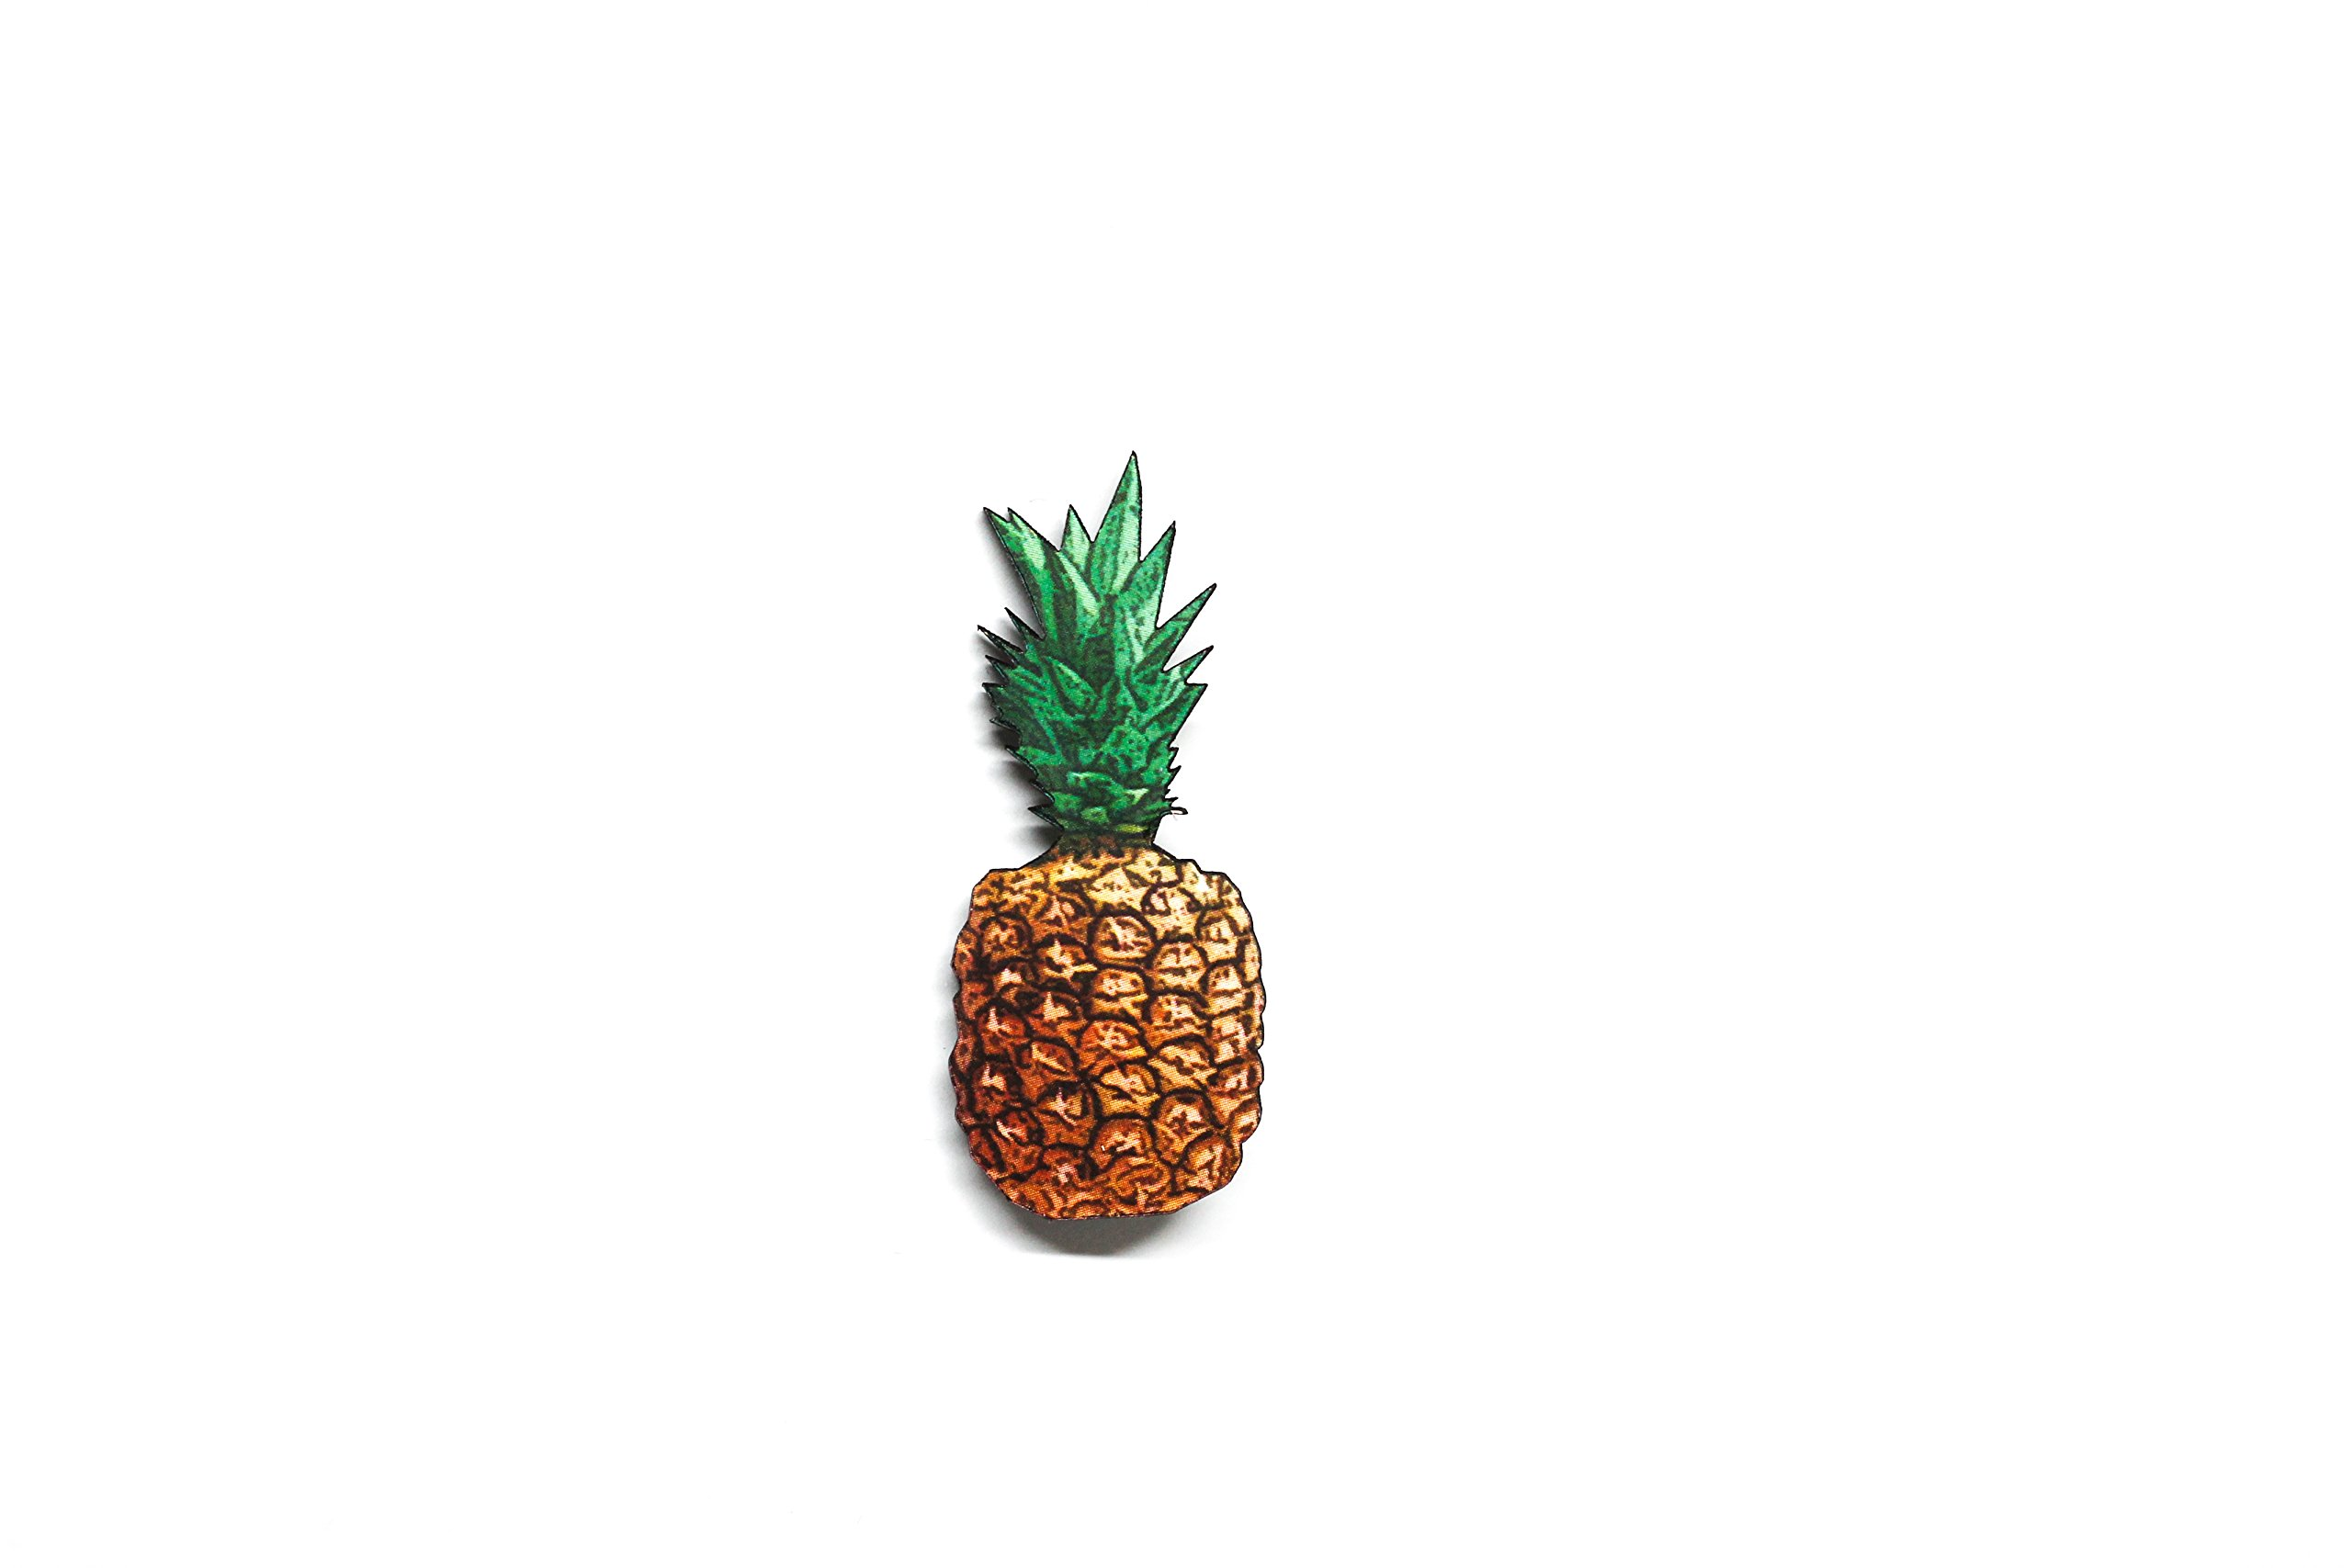 Tropical Pineapple Pinback Wooden Brooch Pin